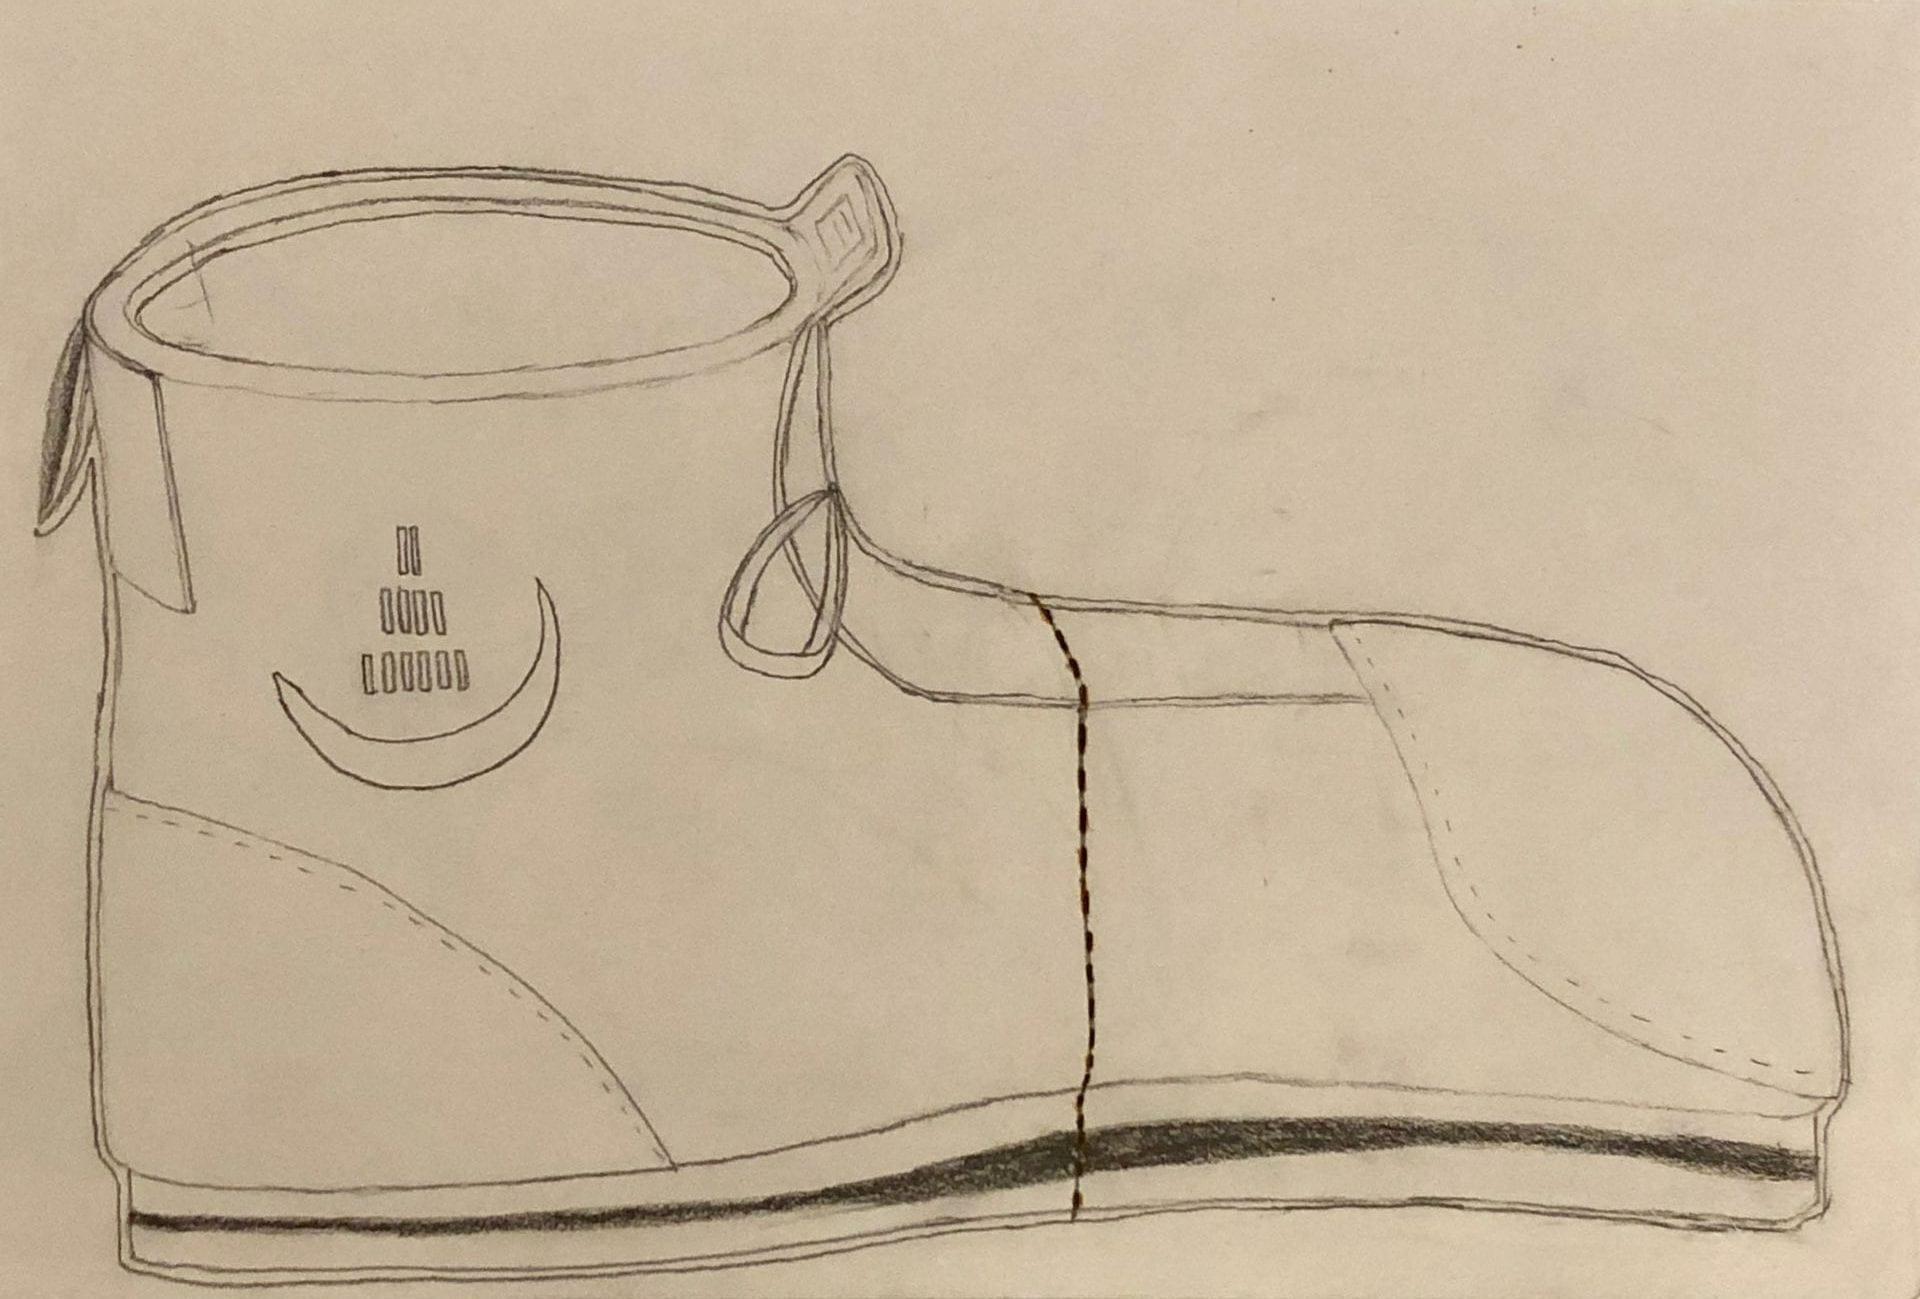 Bridge 1: Proposal & Sketch of My Product Re-design